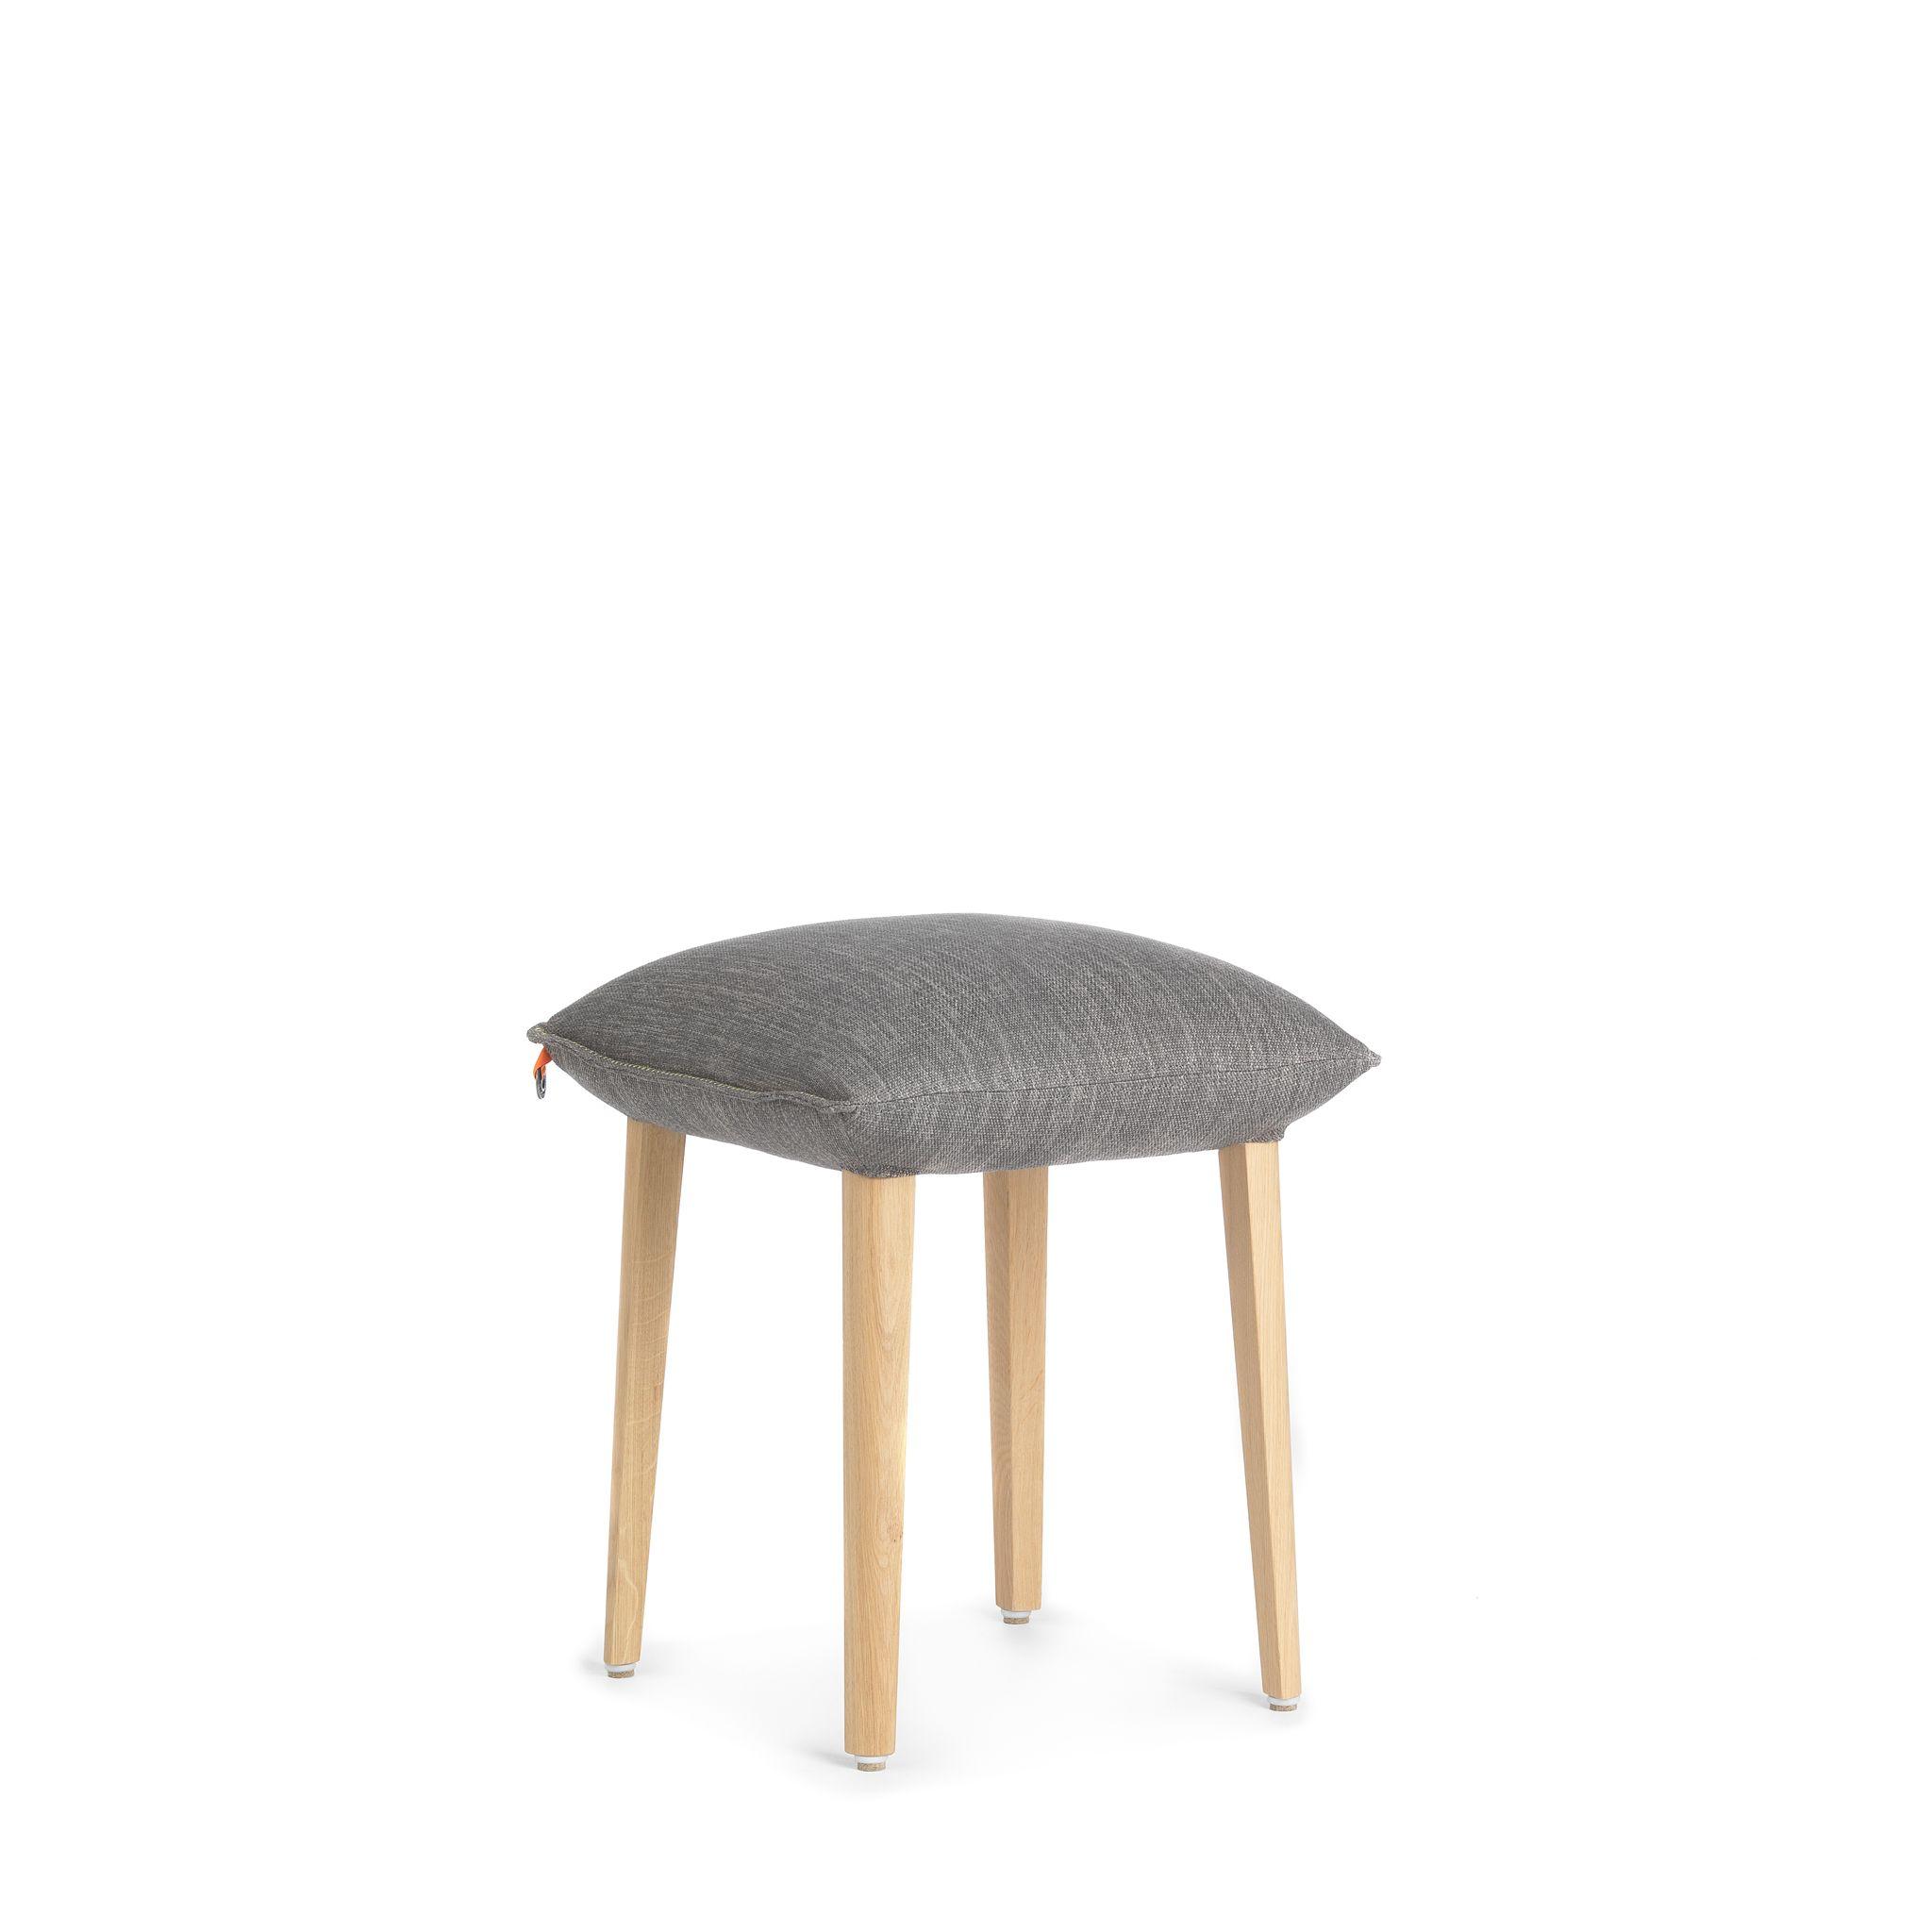 Fabric stool SOFT STOOL UNI H47 -A Soft